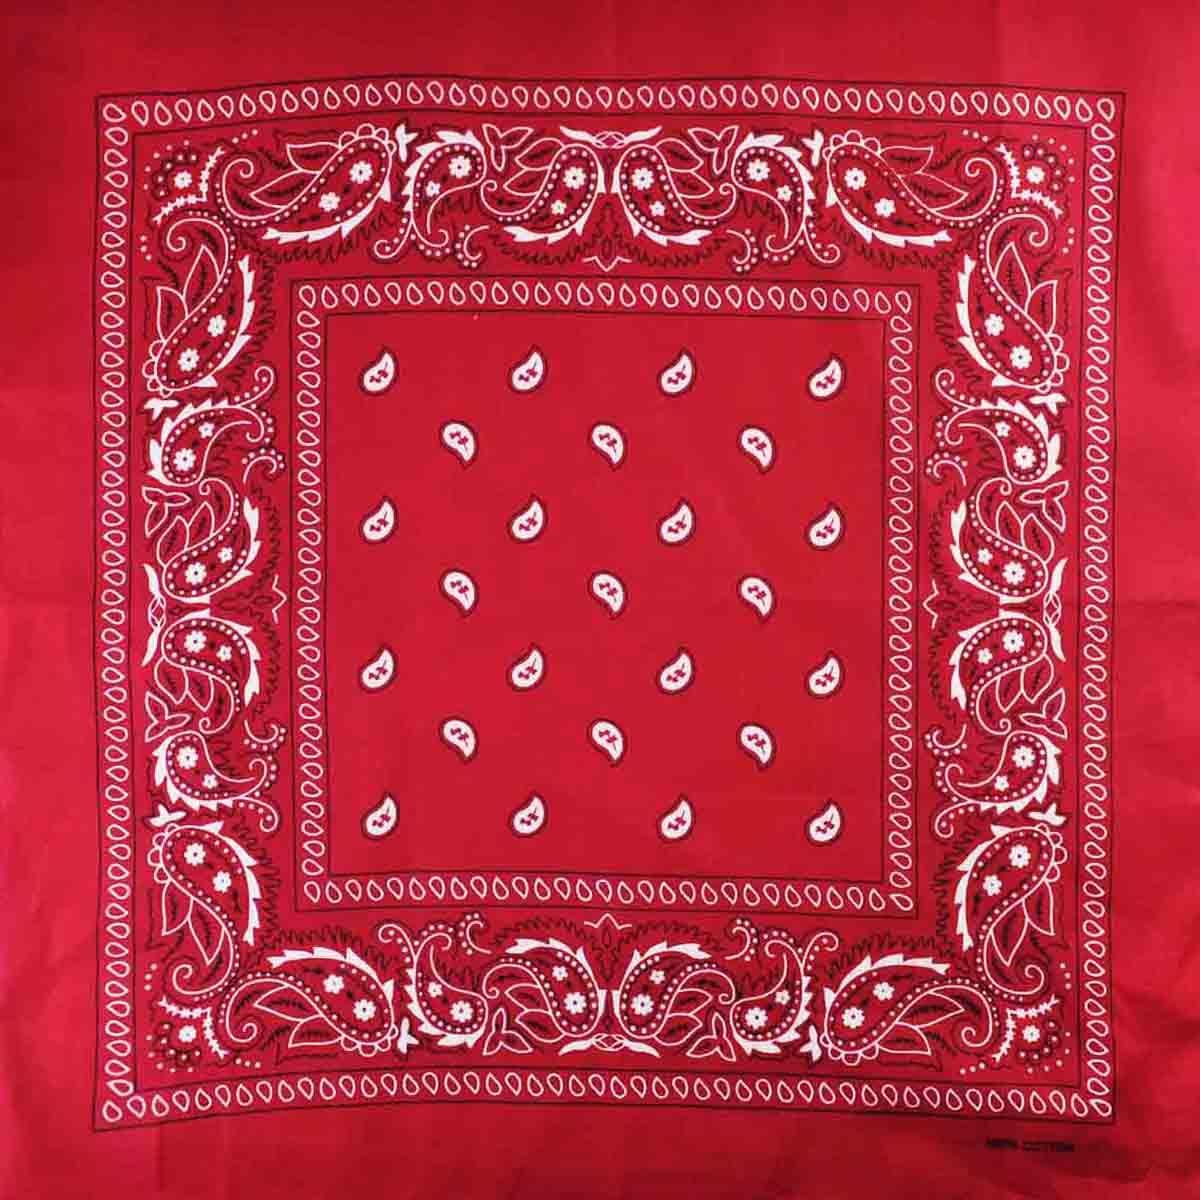 tradizionale-motivo-cachemire-Dragon-YIN-YANG-cachemire-cotone-bandana